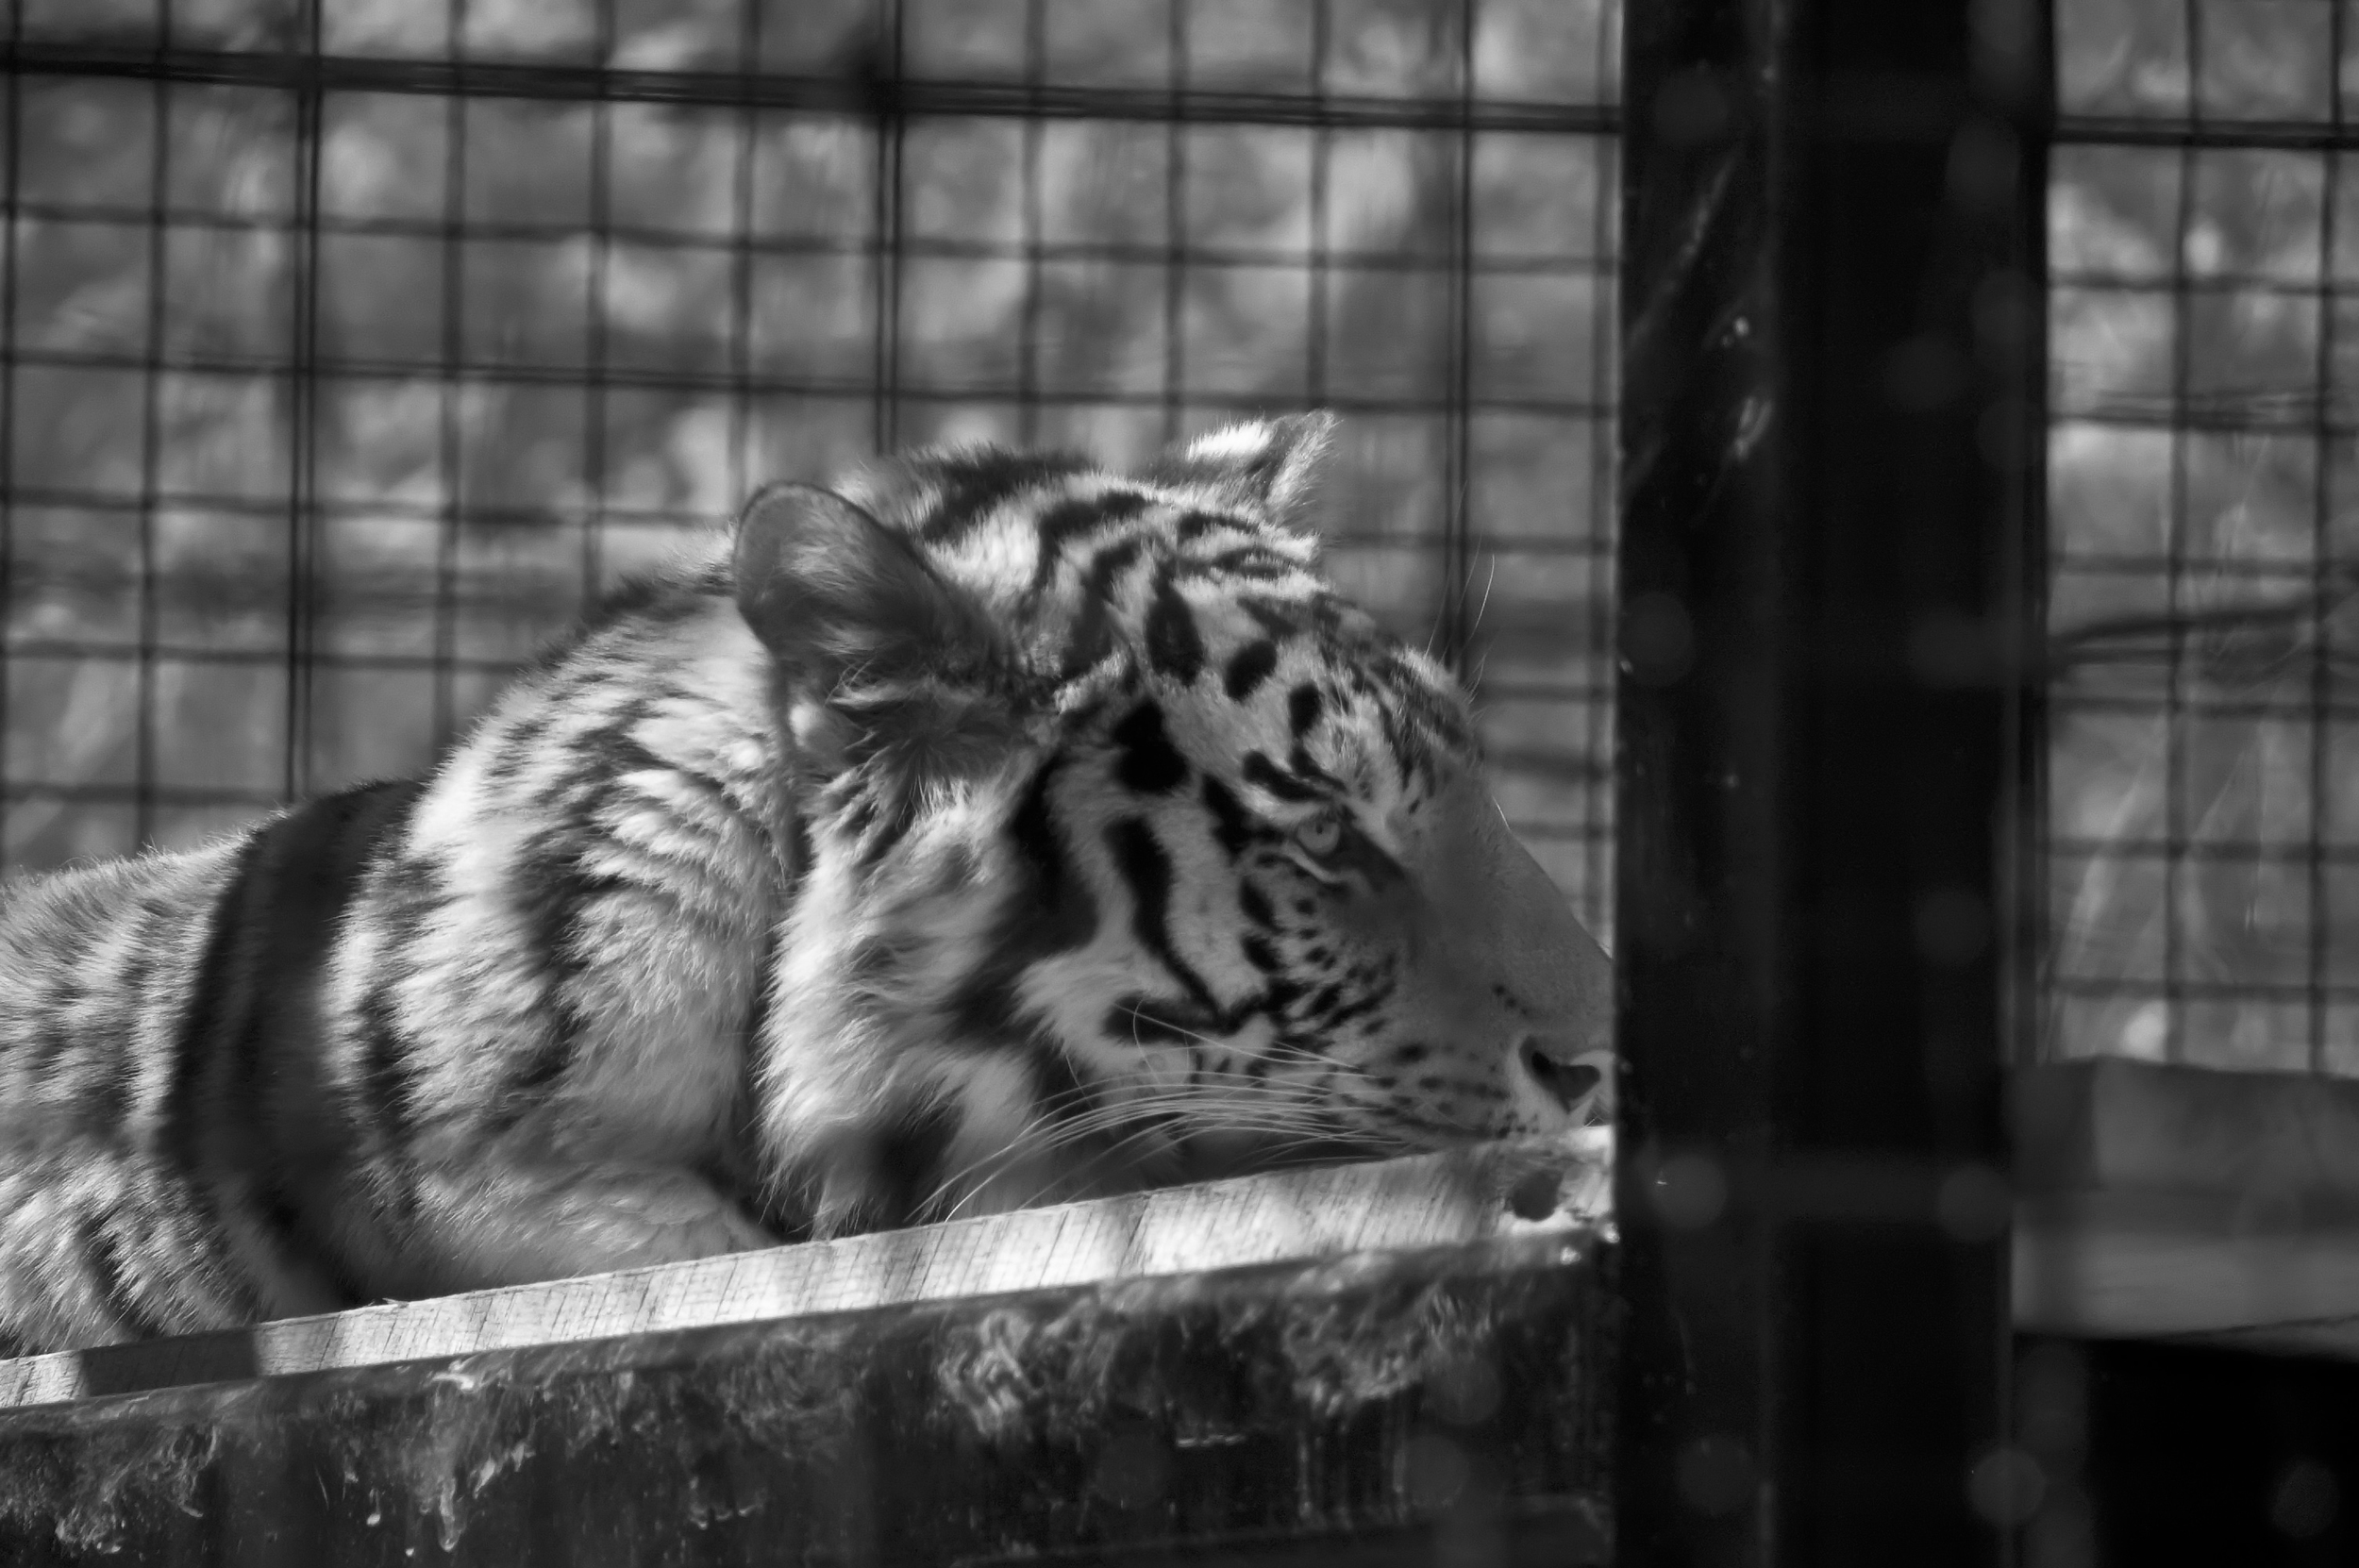 Tiger at Brandywine Zoo